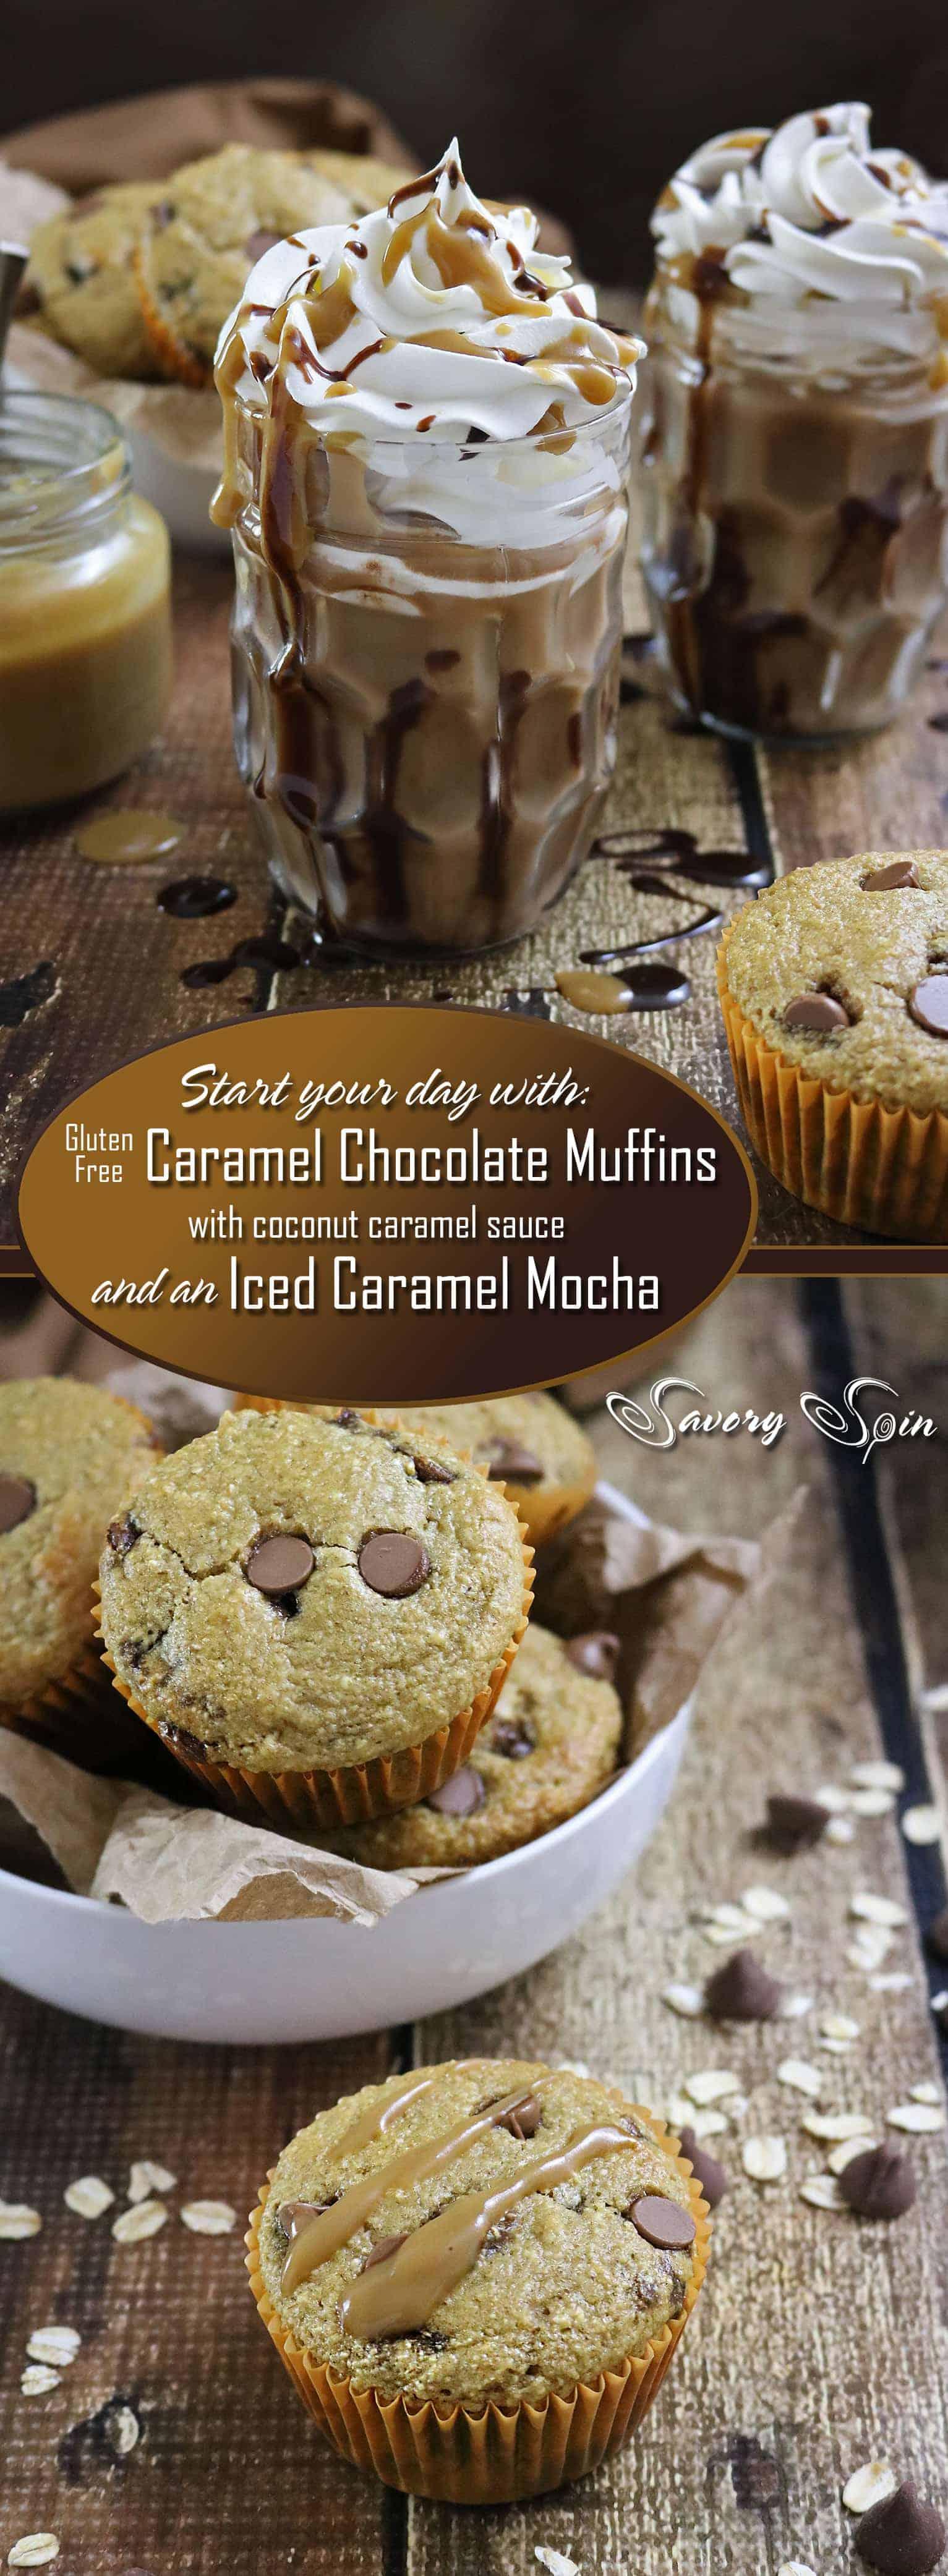 Gluten free Caramel Chocolate Muffins And Iced Caramel Mocha #SilkandSimplyPureCreamers #ad